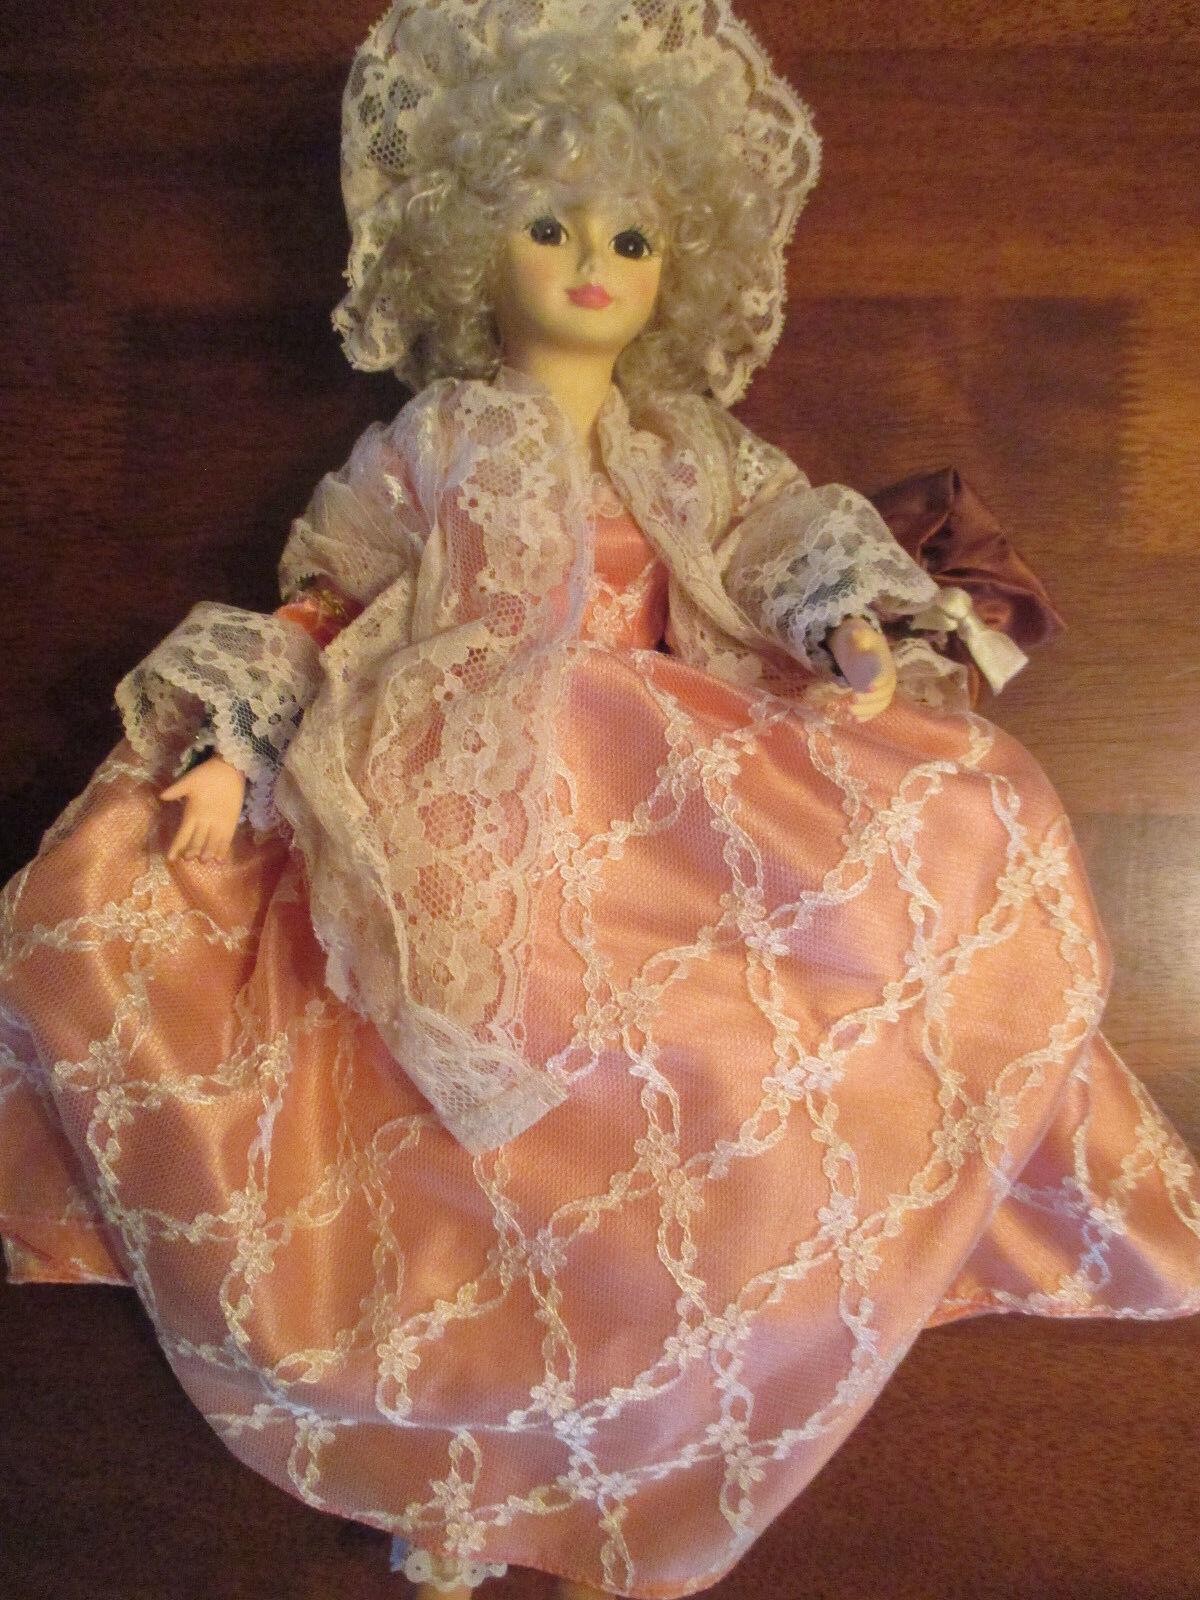 Vintage 1986 BRINNS Collectible Doll MARTHA CUSTIS WASHINGTON Limited Edition